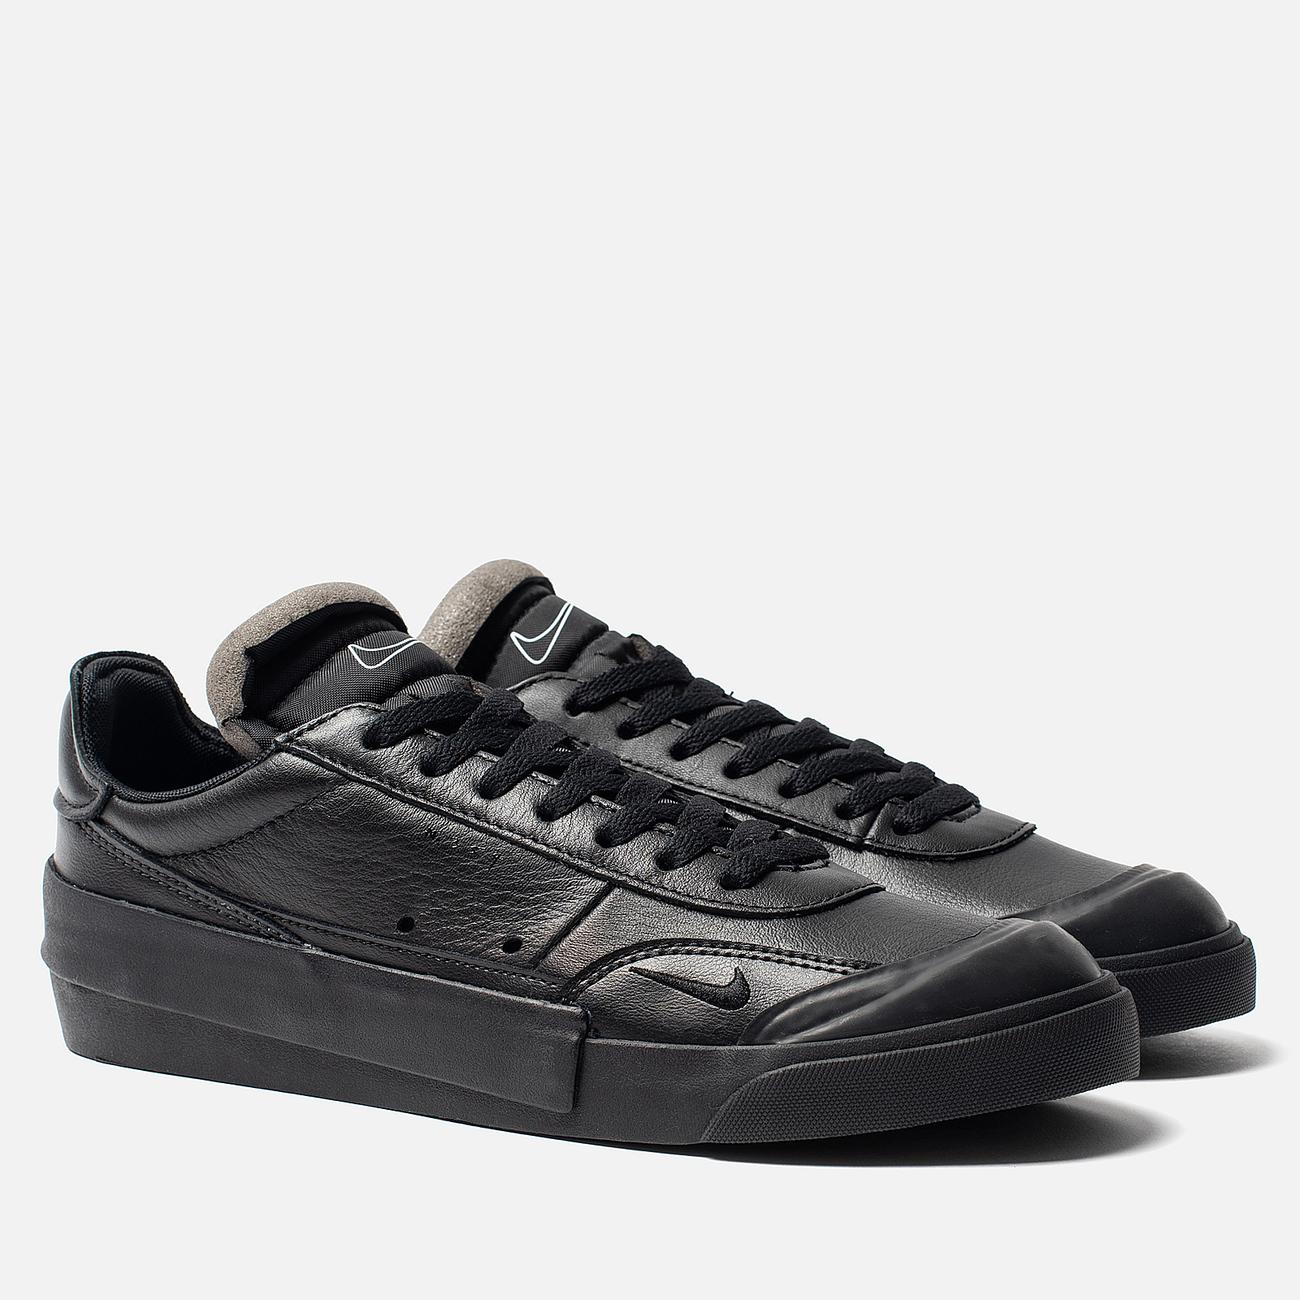 Кроссовки Nike Drop Type LX Premium Black/White